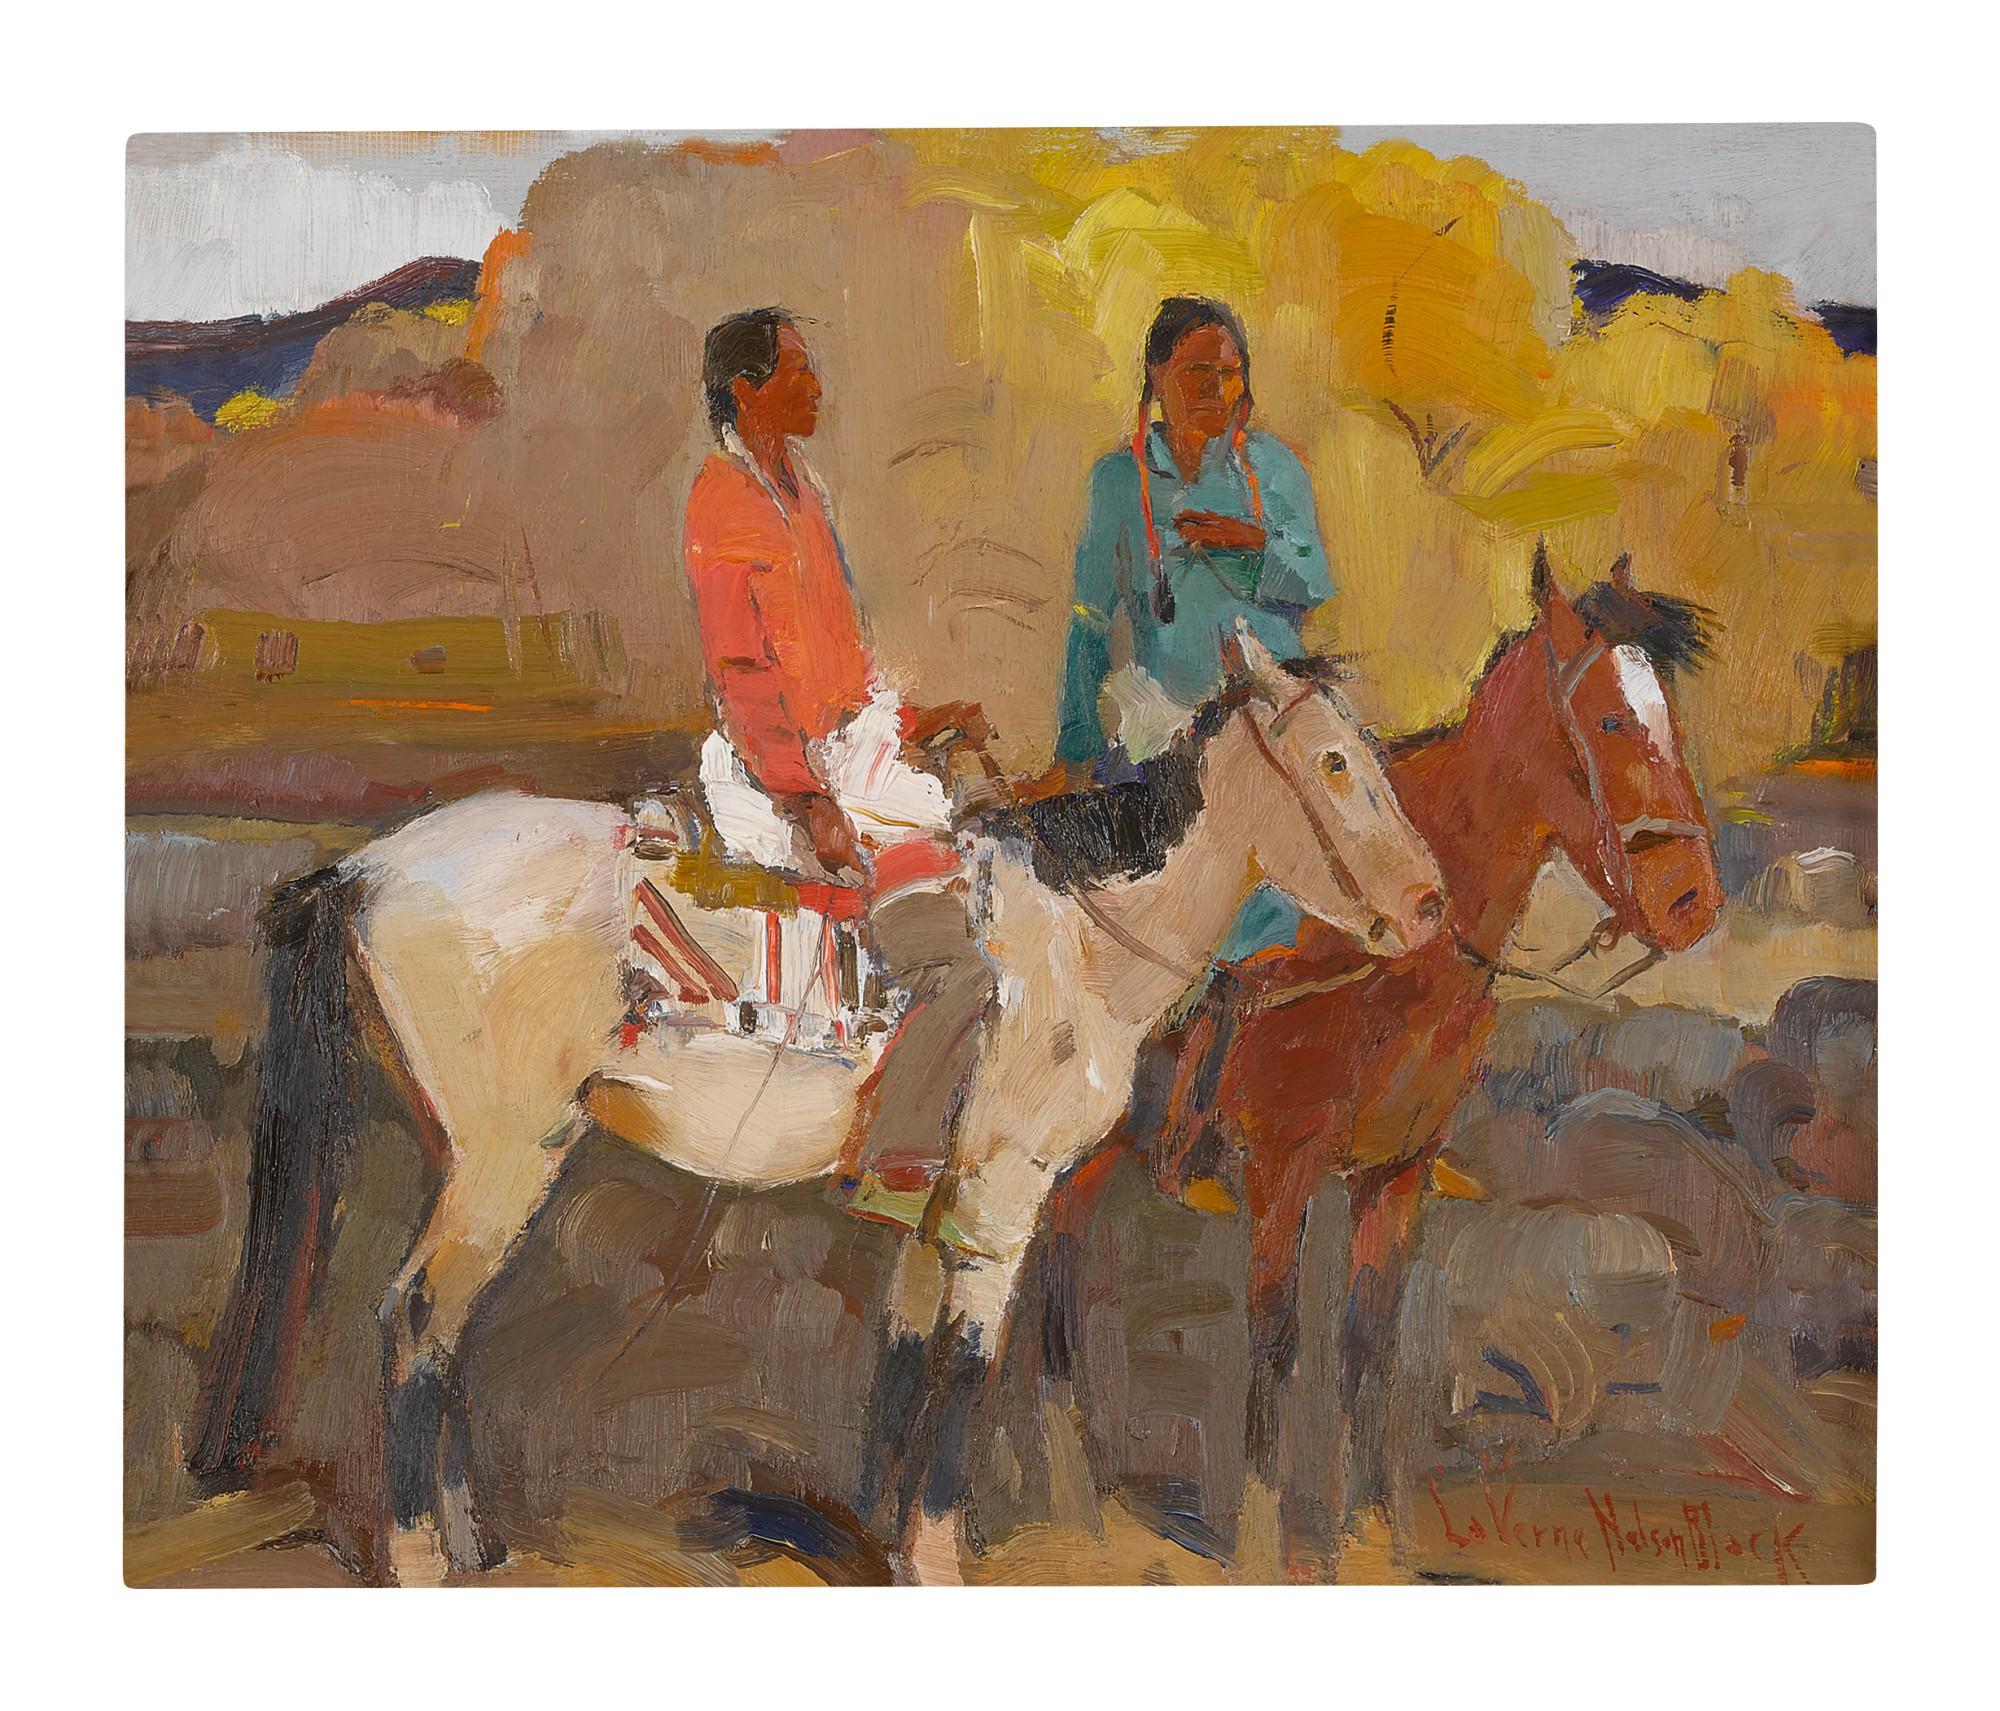 LAVERNE NELSON BLACK | TWO INDIAN MEN ON HORSEBACK